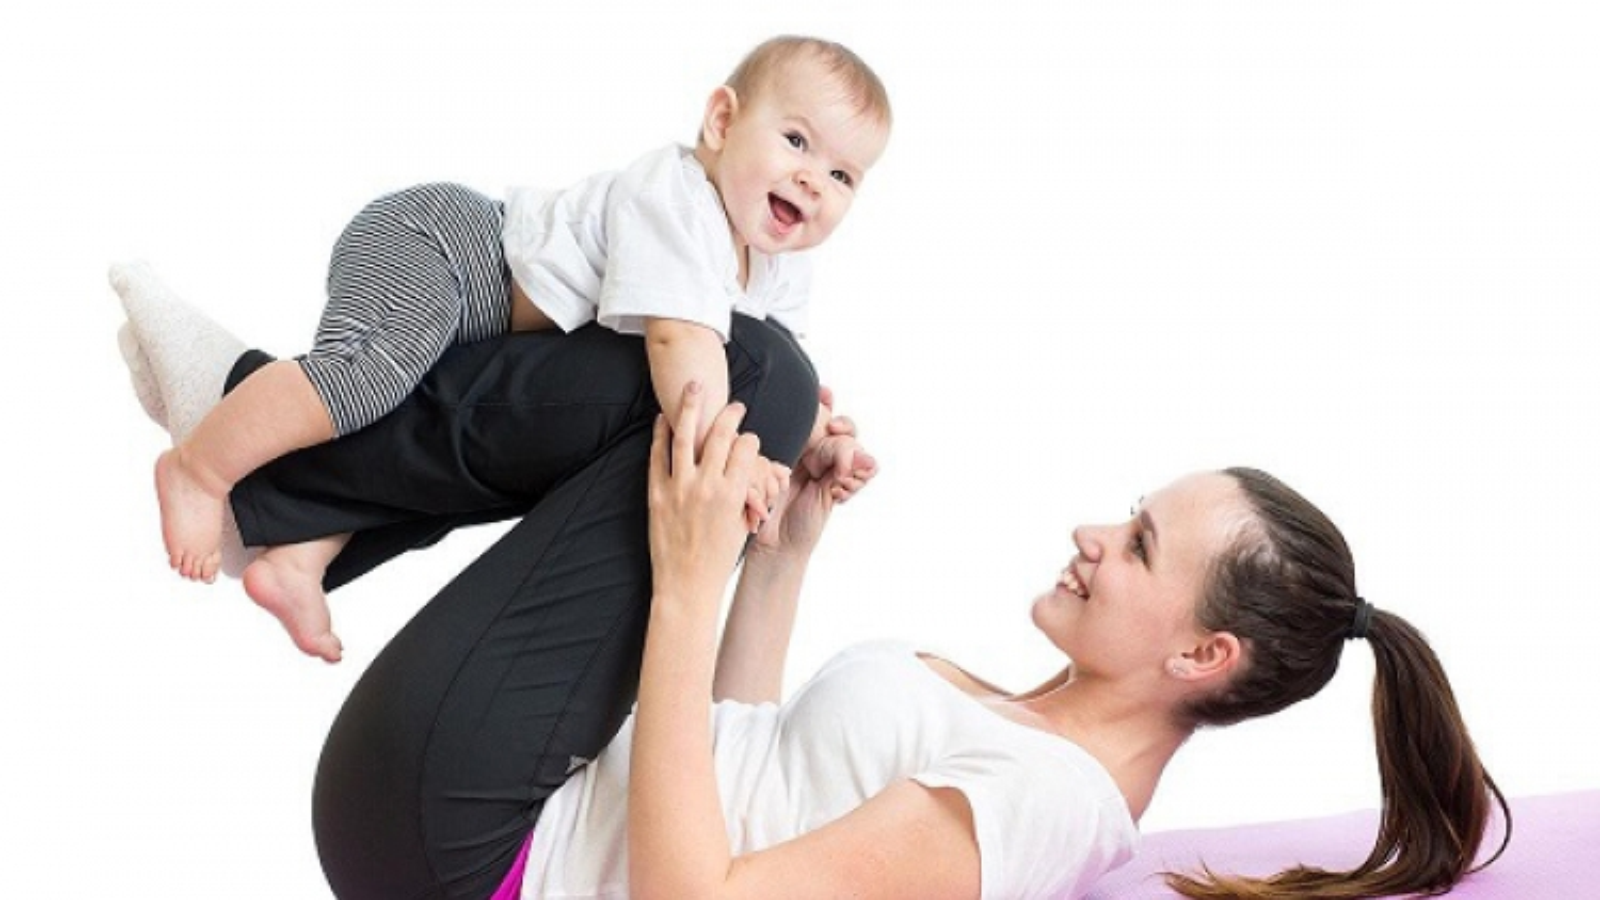 Mẹo giảm cân hiệu quả cho phụ nữ sau sinh